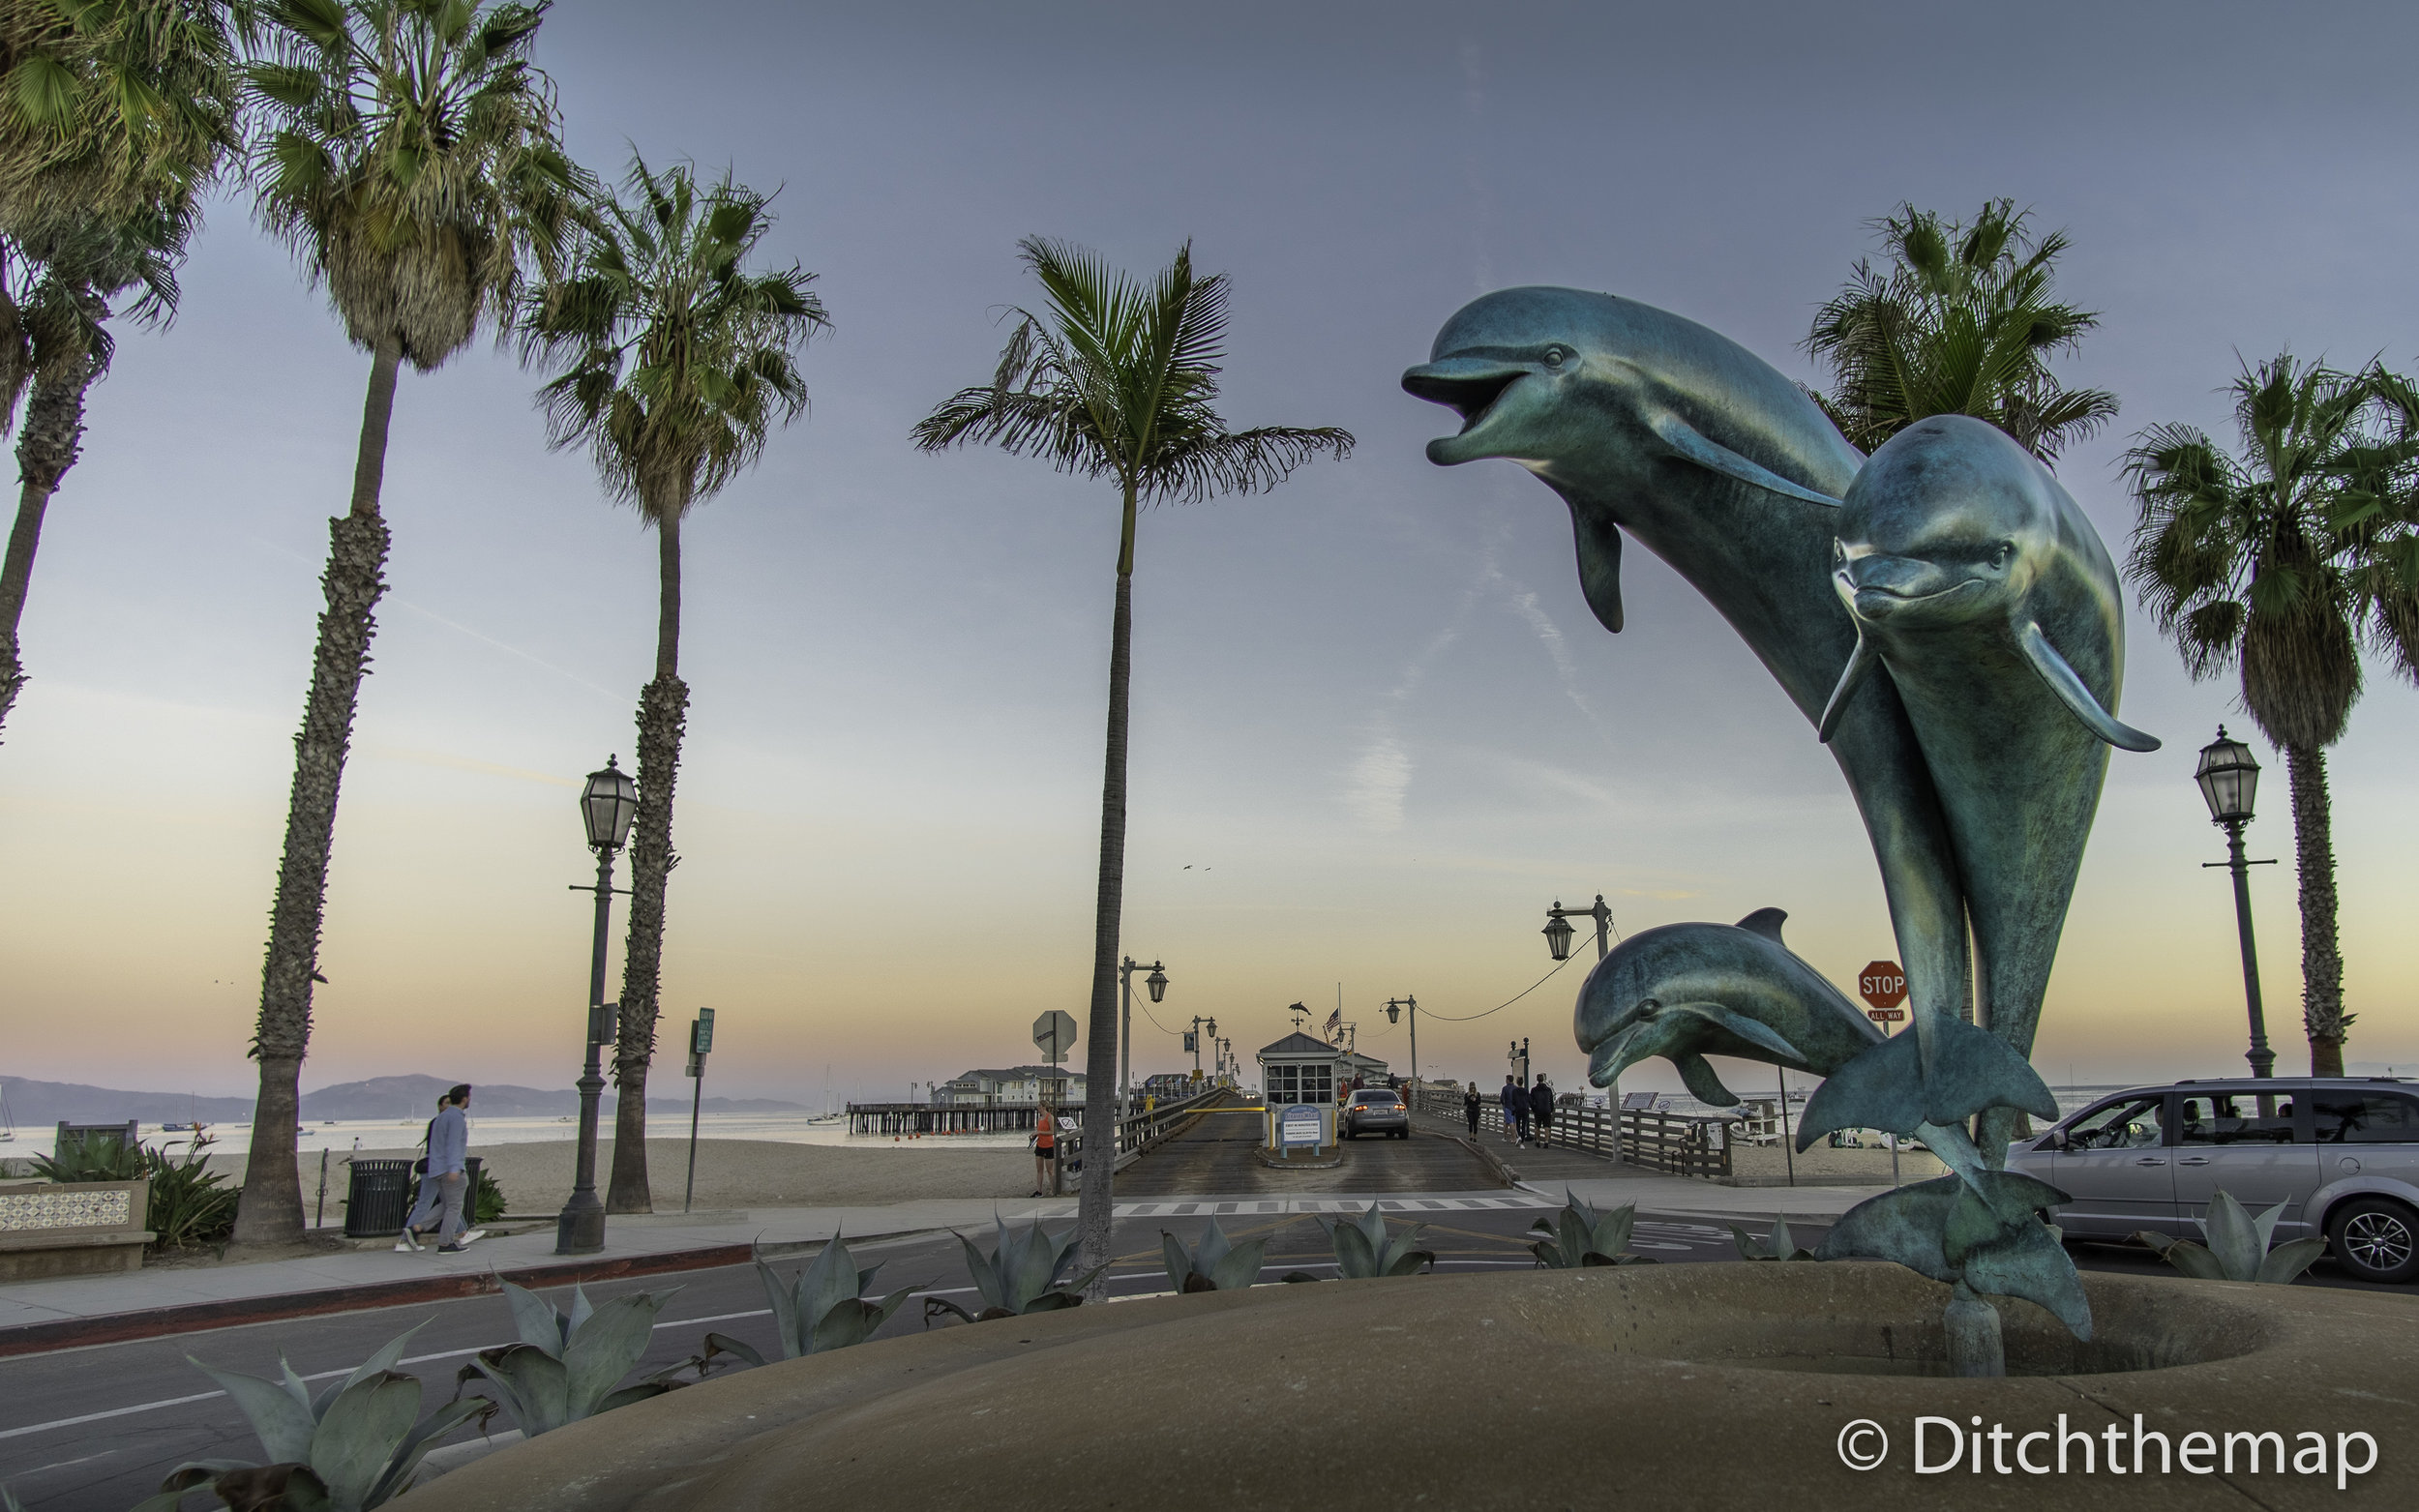 Dolphin Fountain at Stearns Wharf